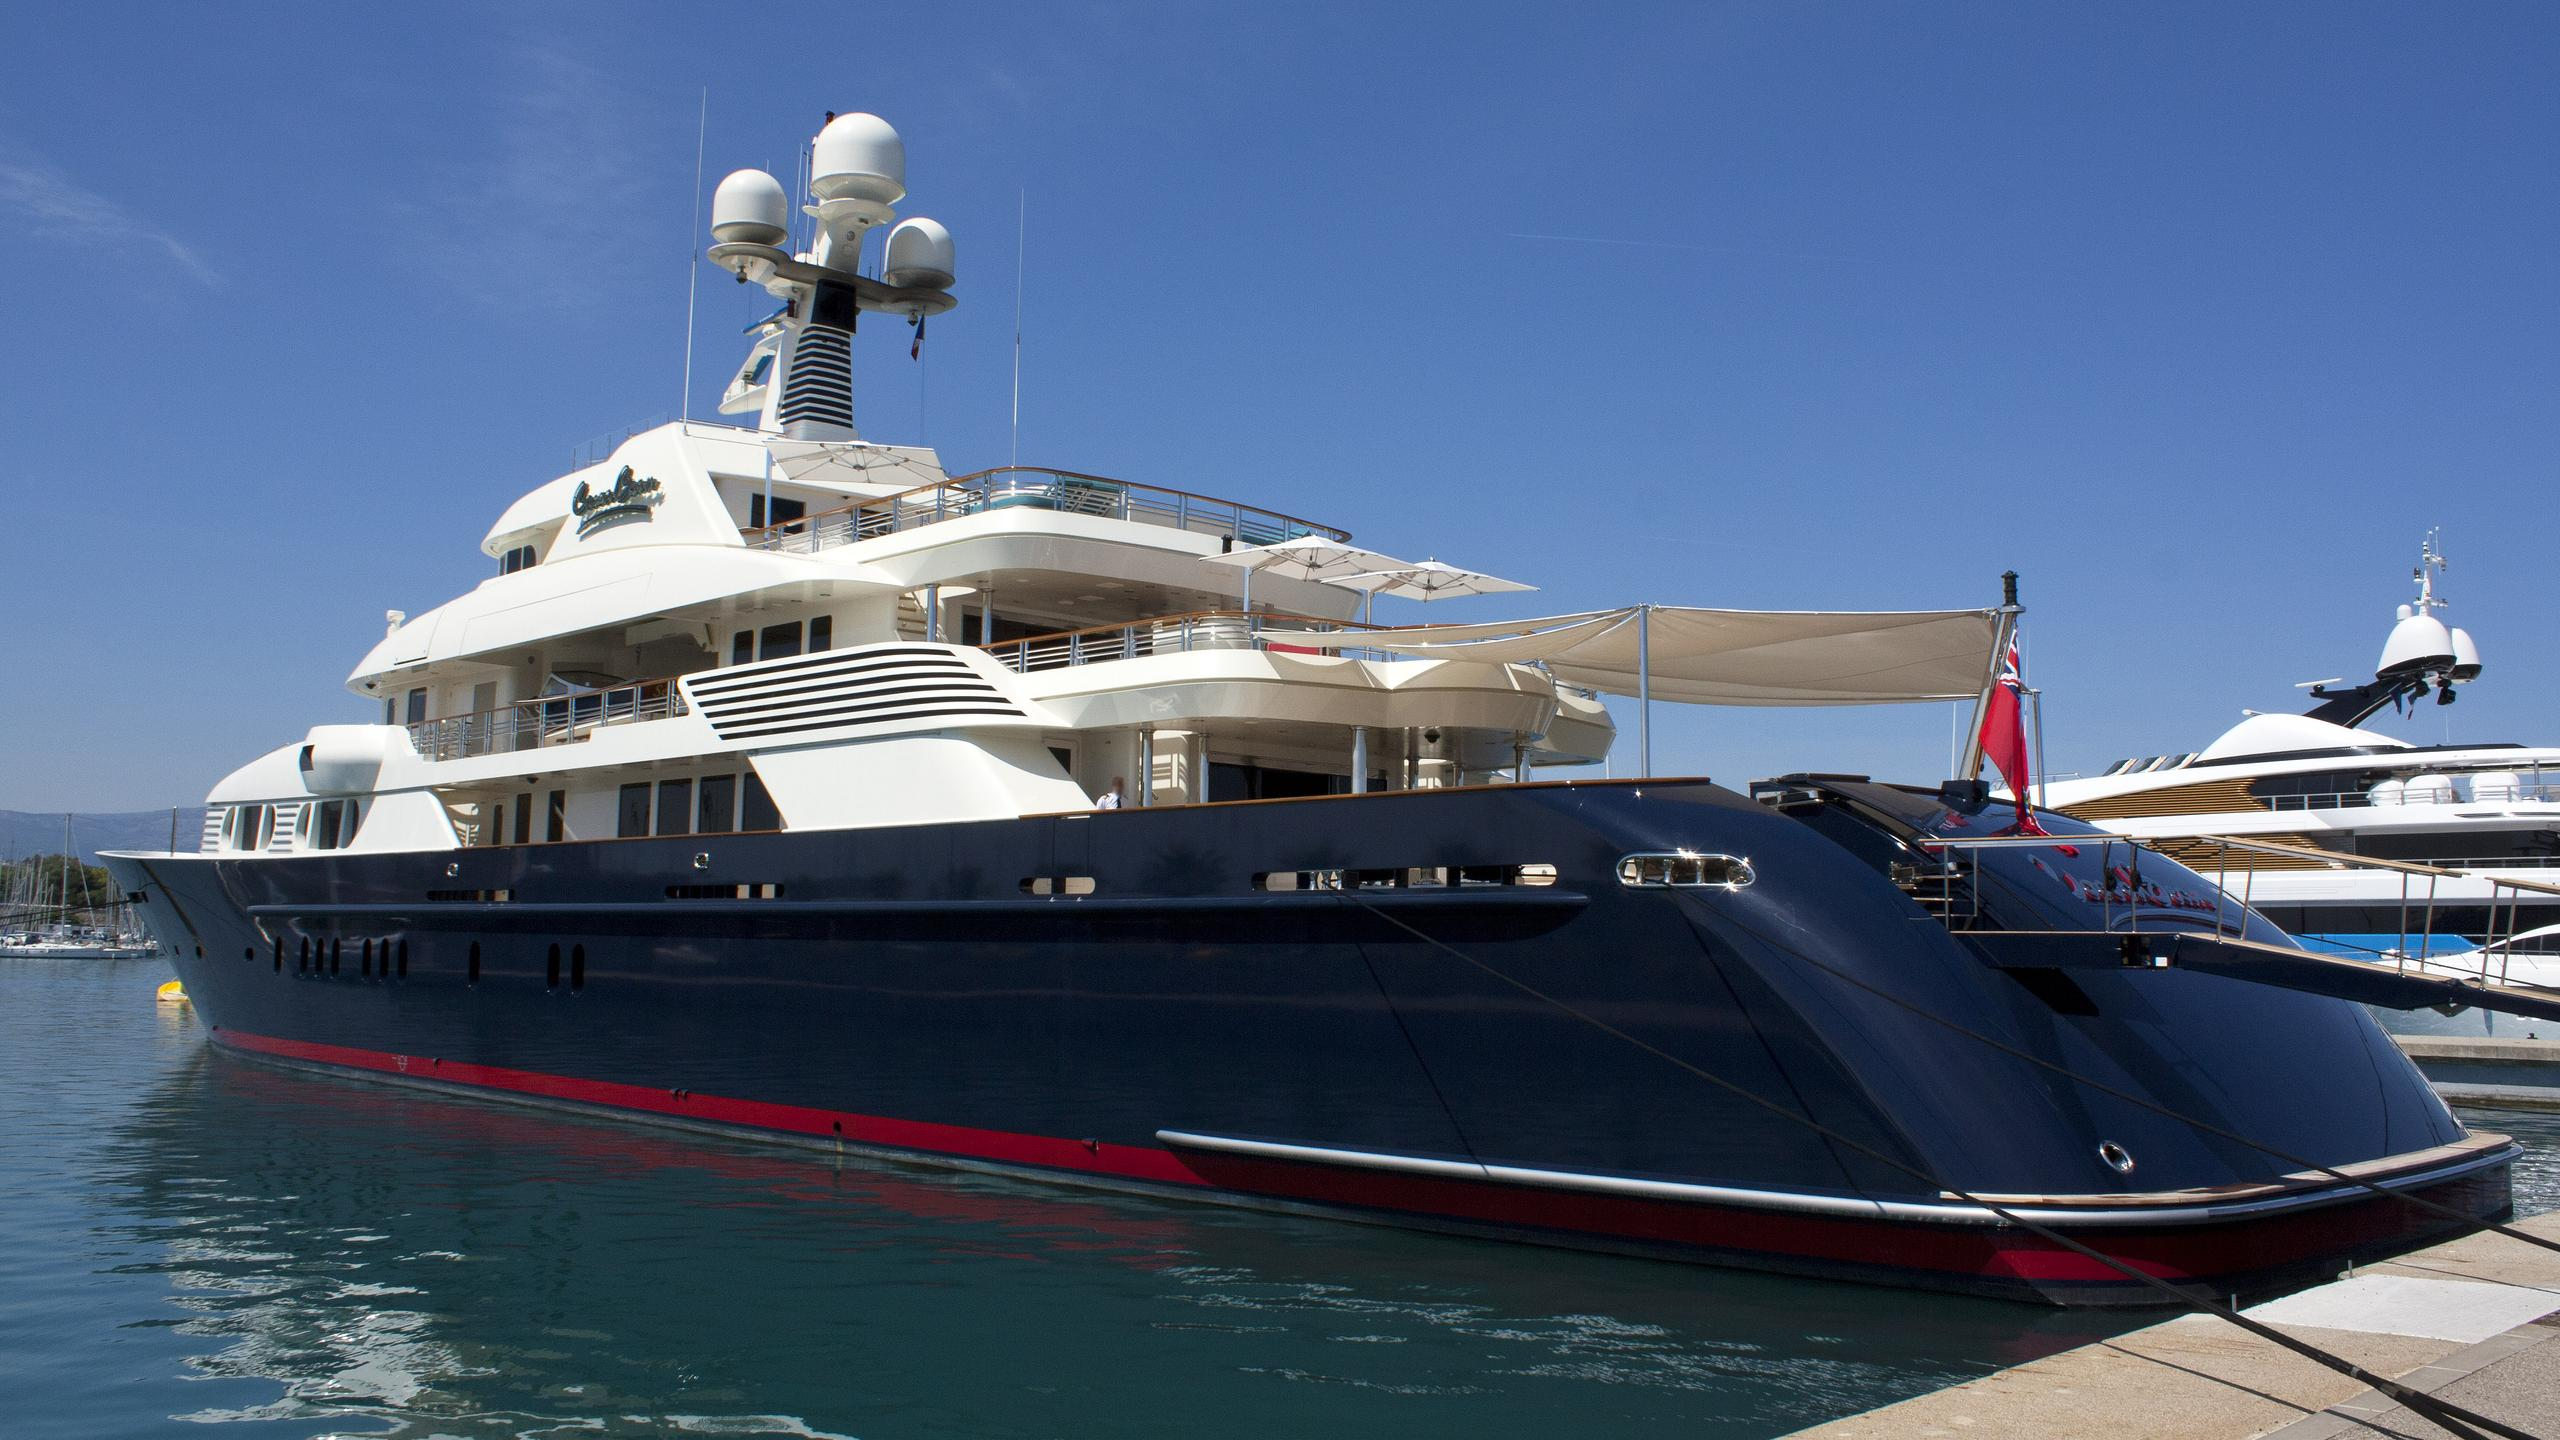 cocoa-bean-motor-yacht-trinity-2013-47m-half-profile